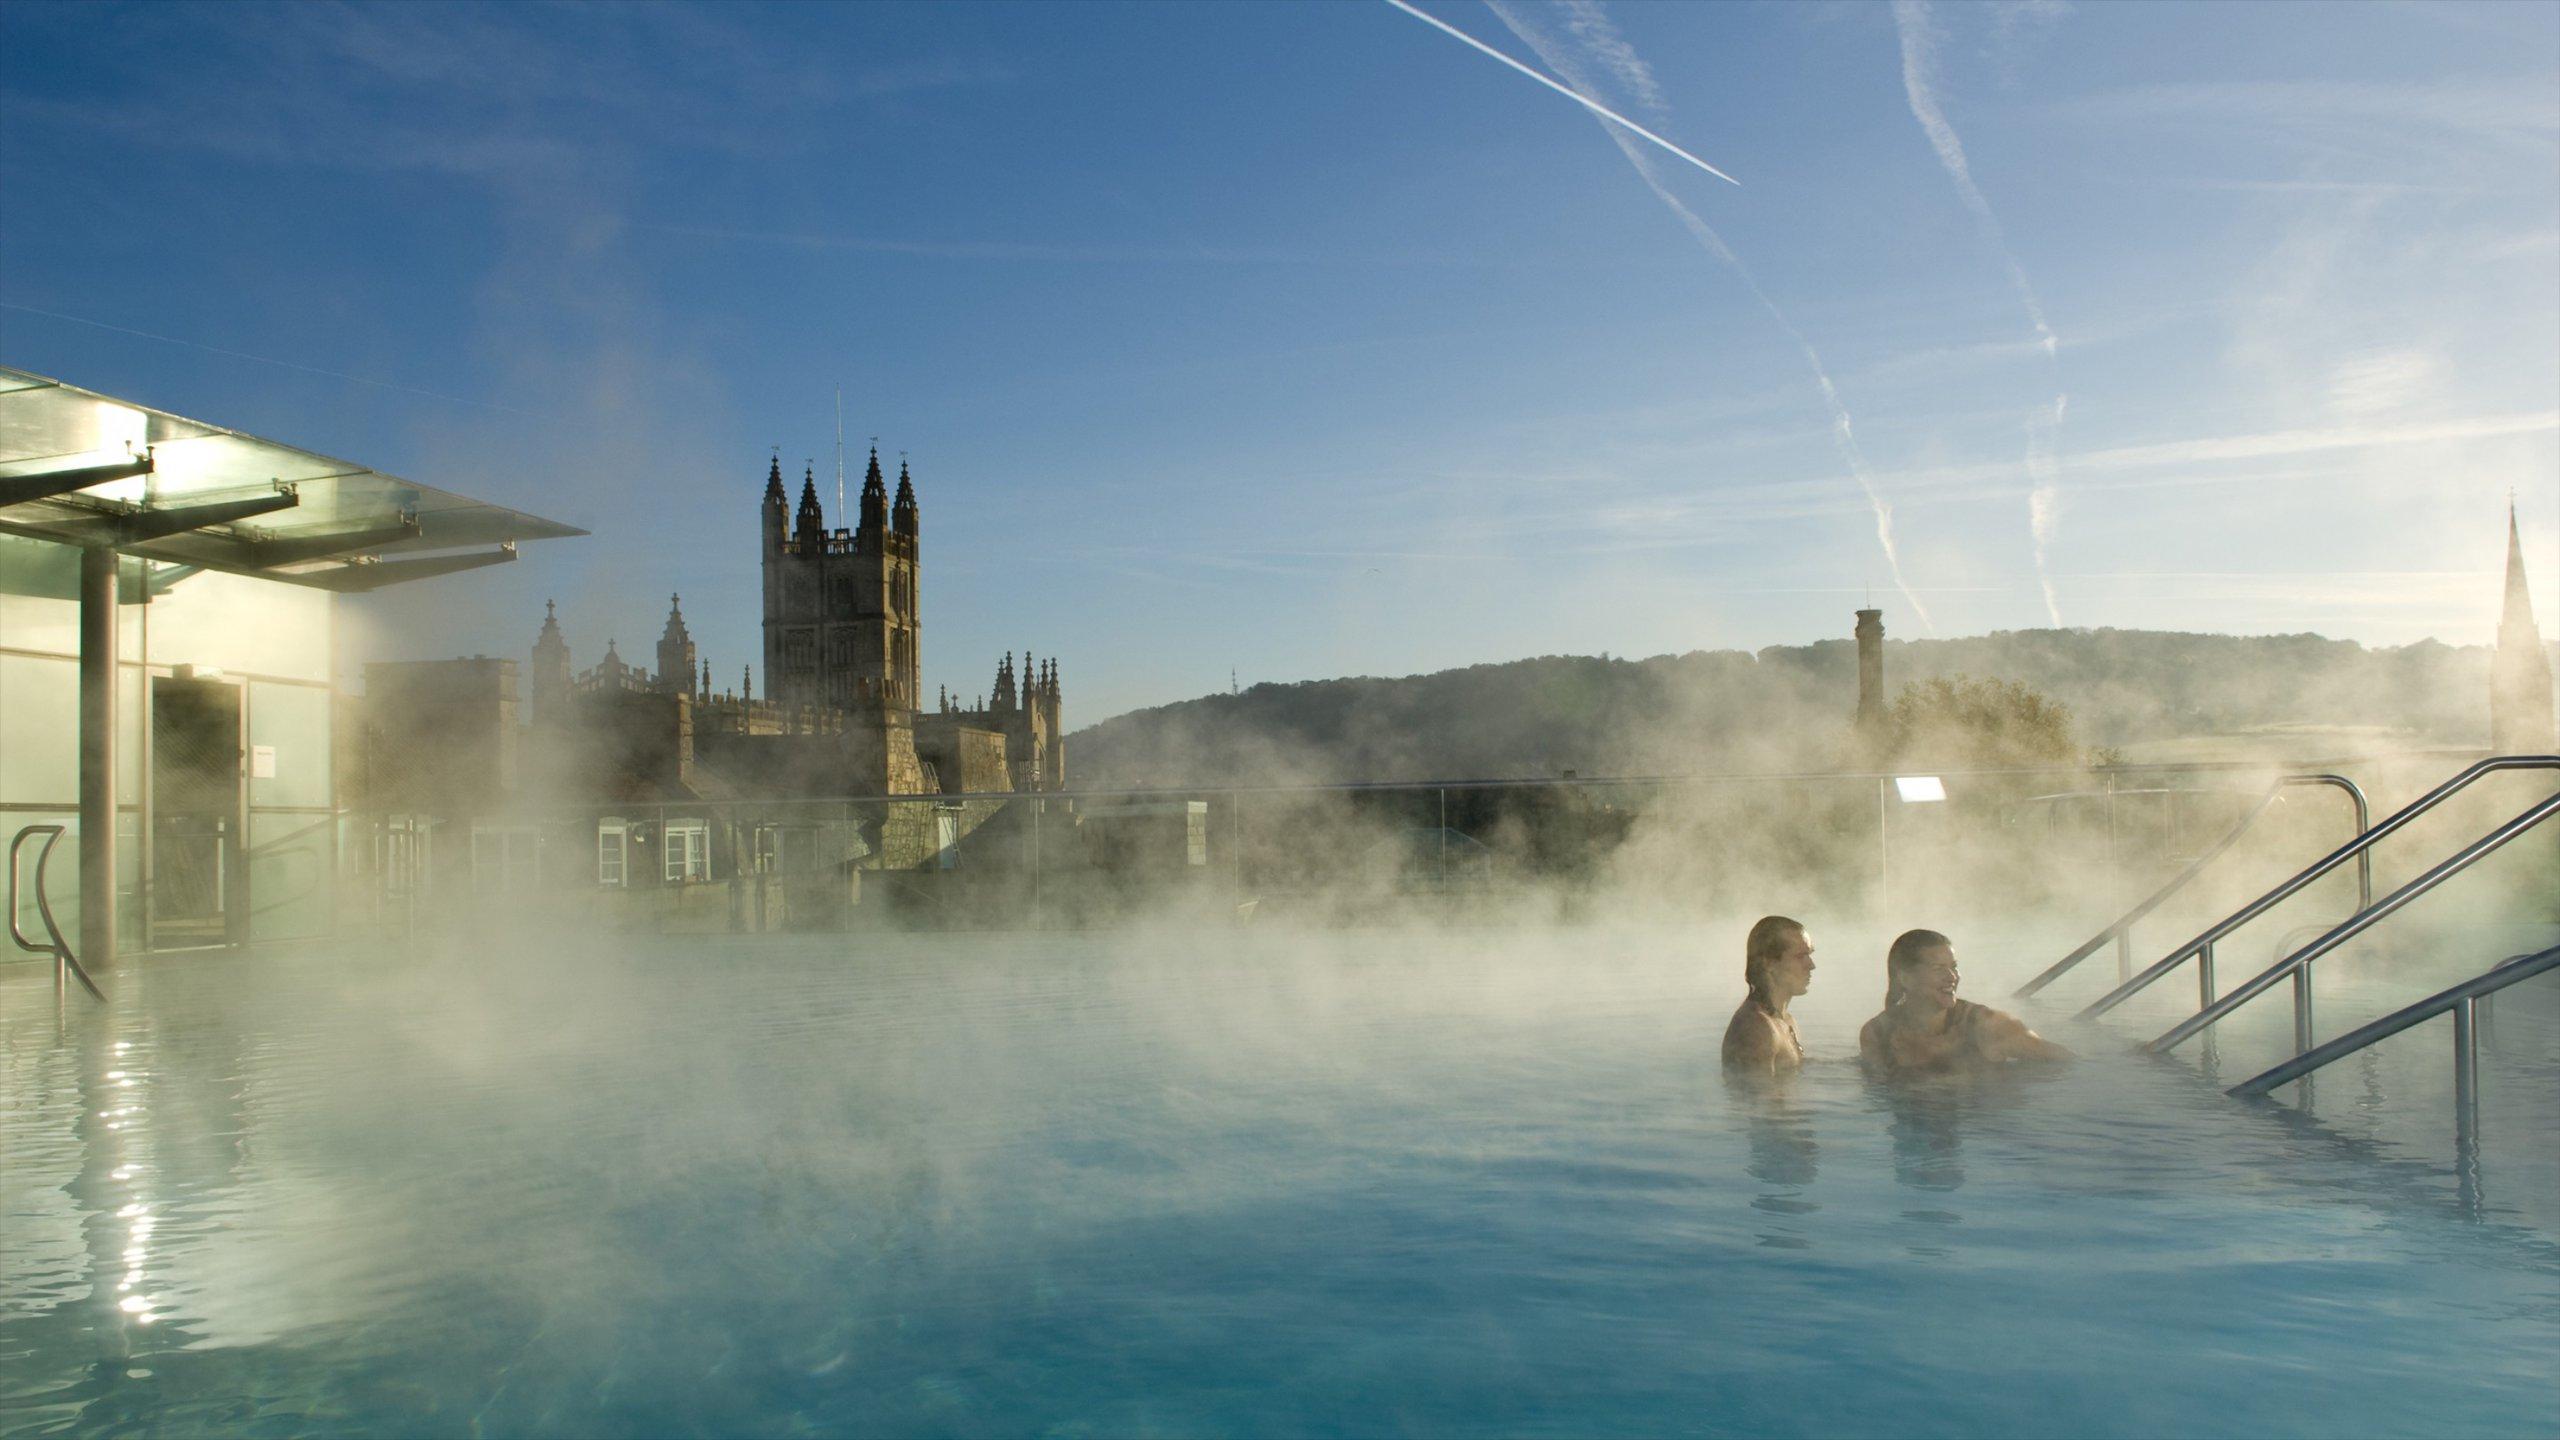 Bath and North East Somerset, England, United Kingdom